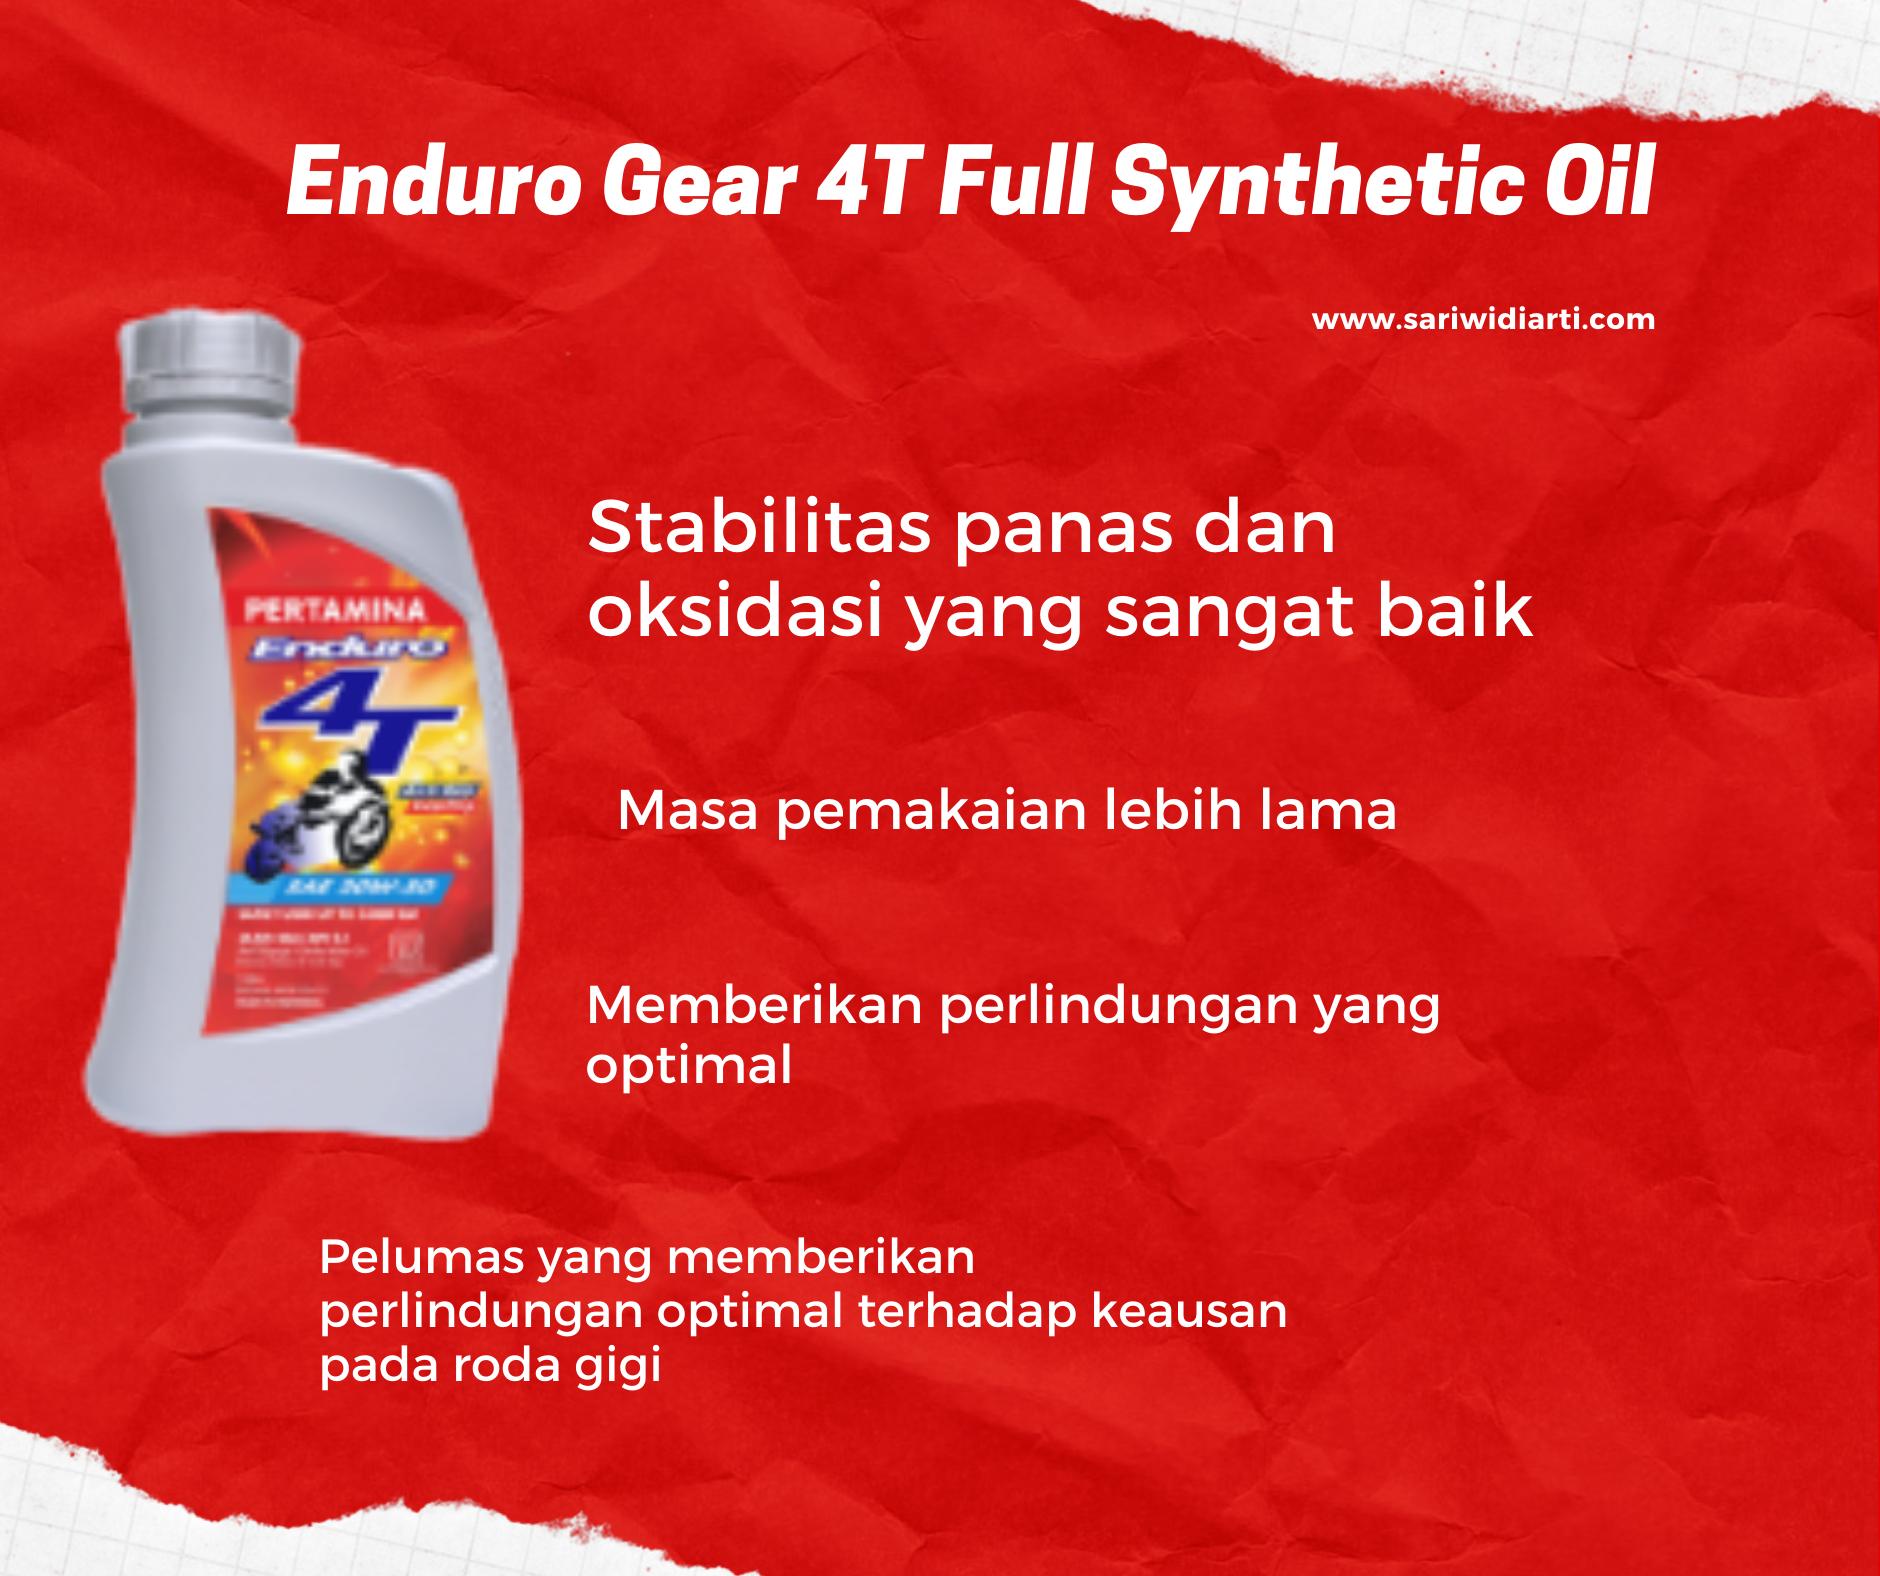 Enduro Gear 4T Full Synthetic Oil